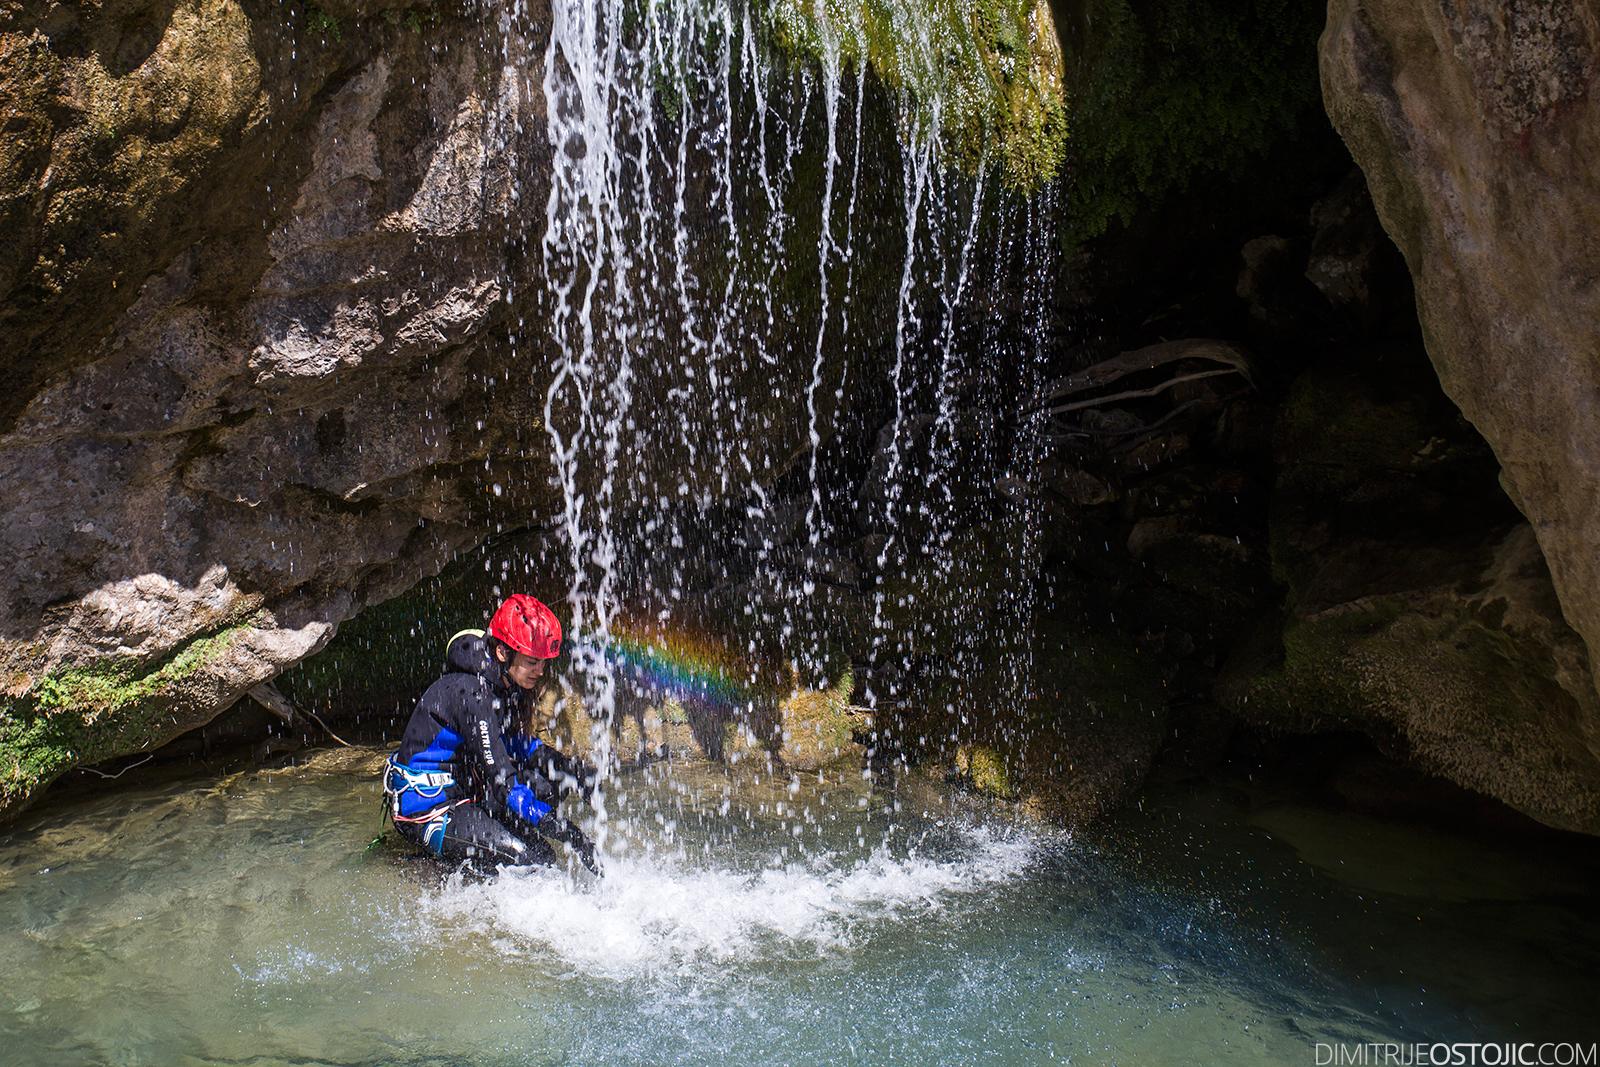 Medjurecki Potok canyon, Montenegro 2016. © www.dimitrijeostojic.com